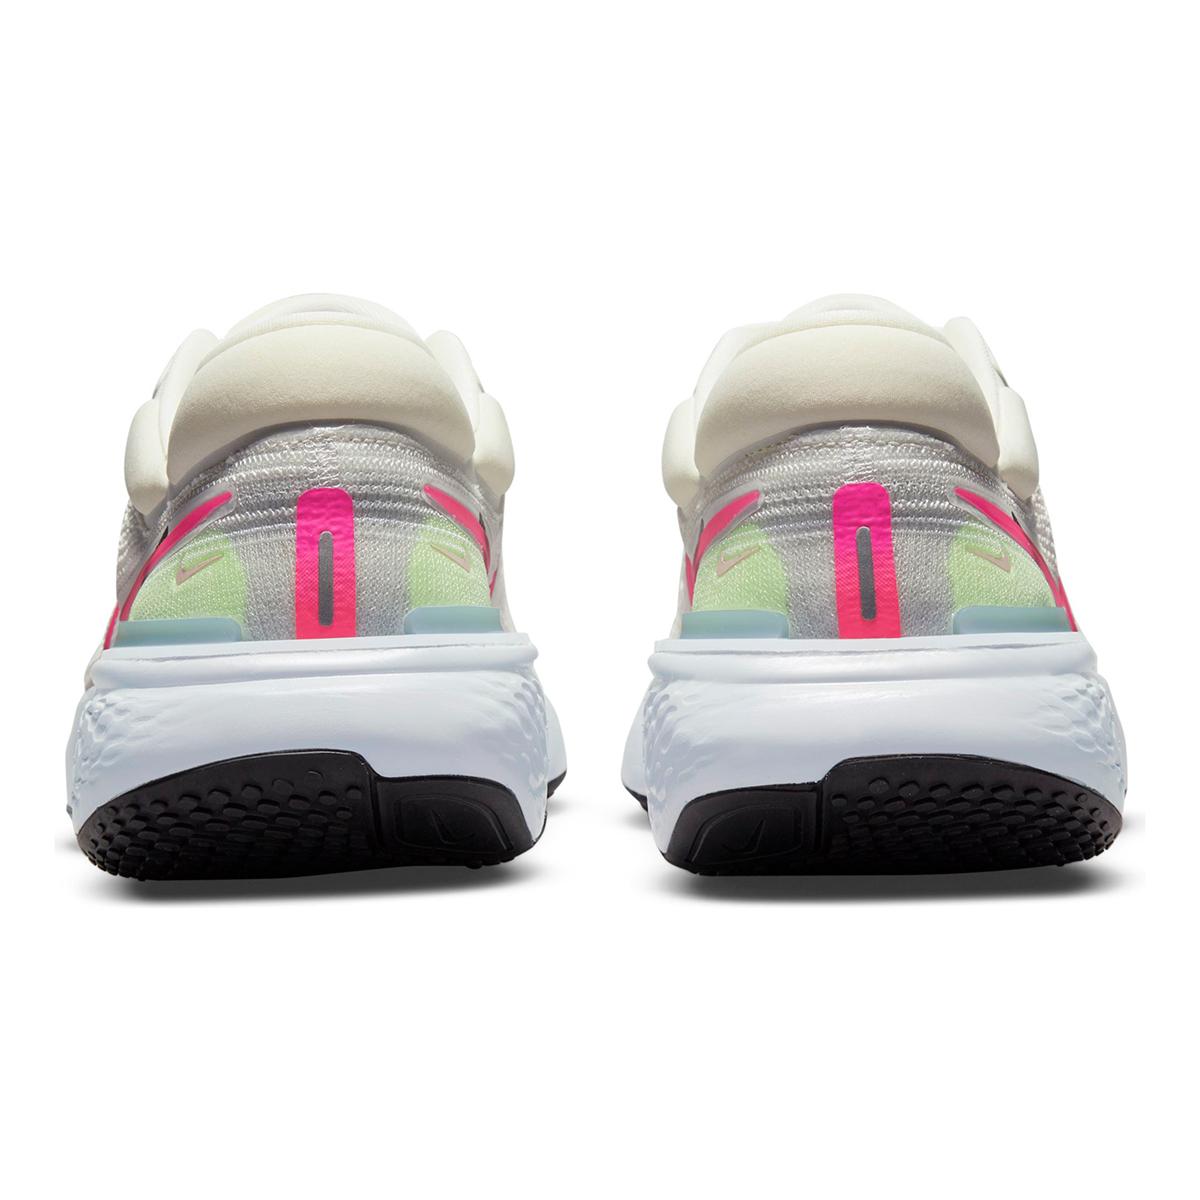 Men's Nike ZoomX Invincible Run Flyknit Running Shoe - Color: Rawdacious - Size: 6 - Width: Regular, Rawdacious, large, image 6